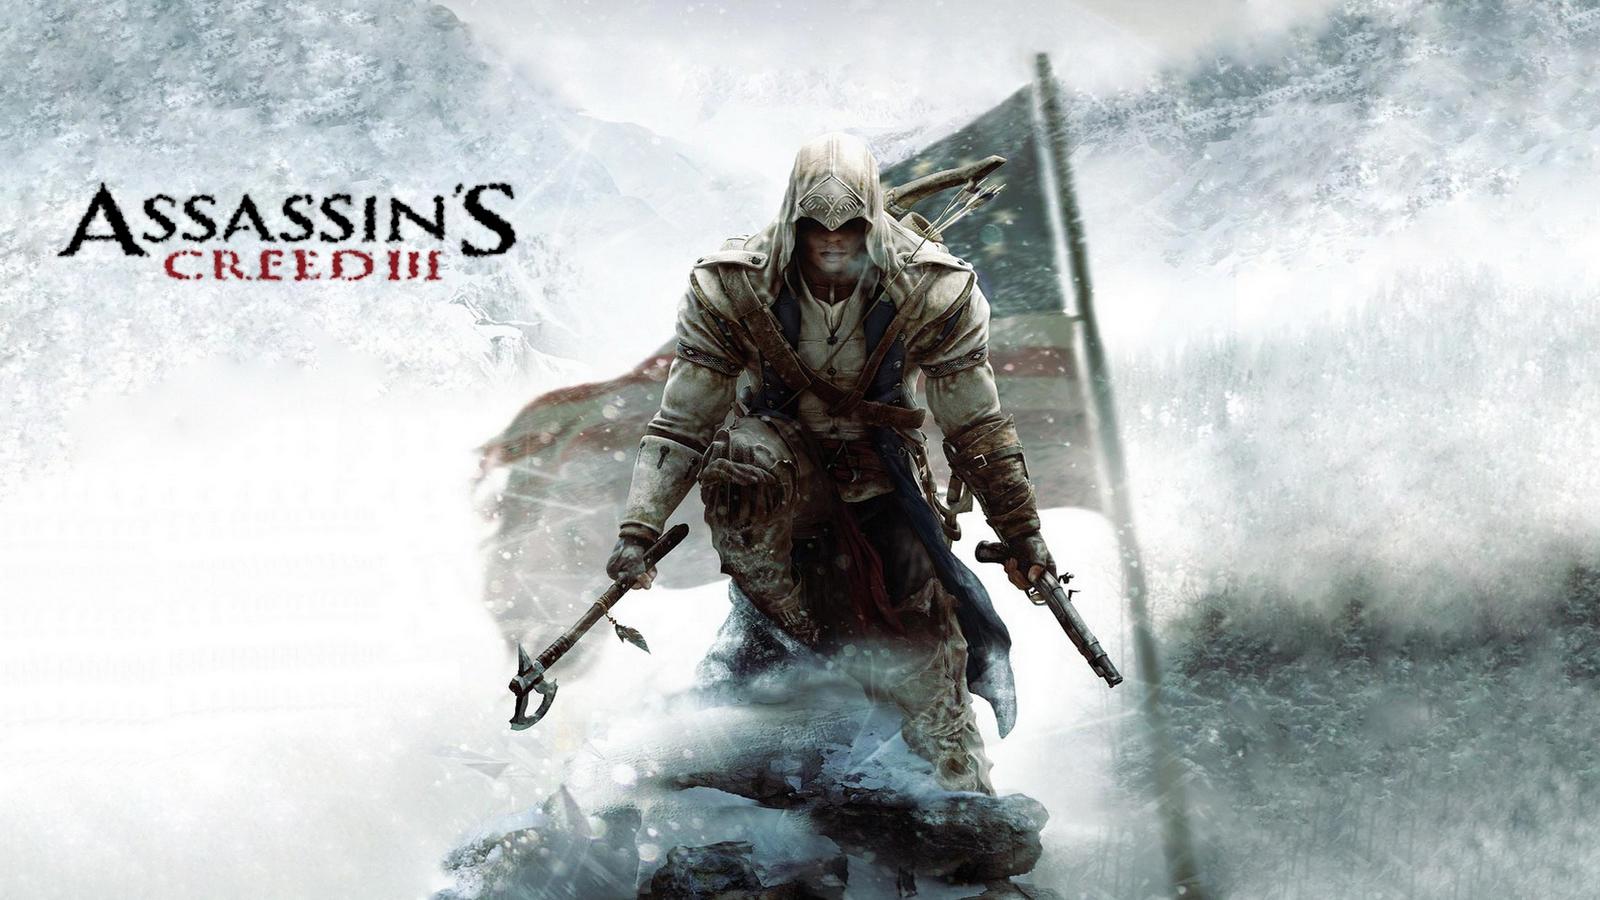 Assassins Creed 3 Wallpaper hd 1920x1080 Assassins Creed Iii 1600x900